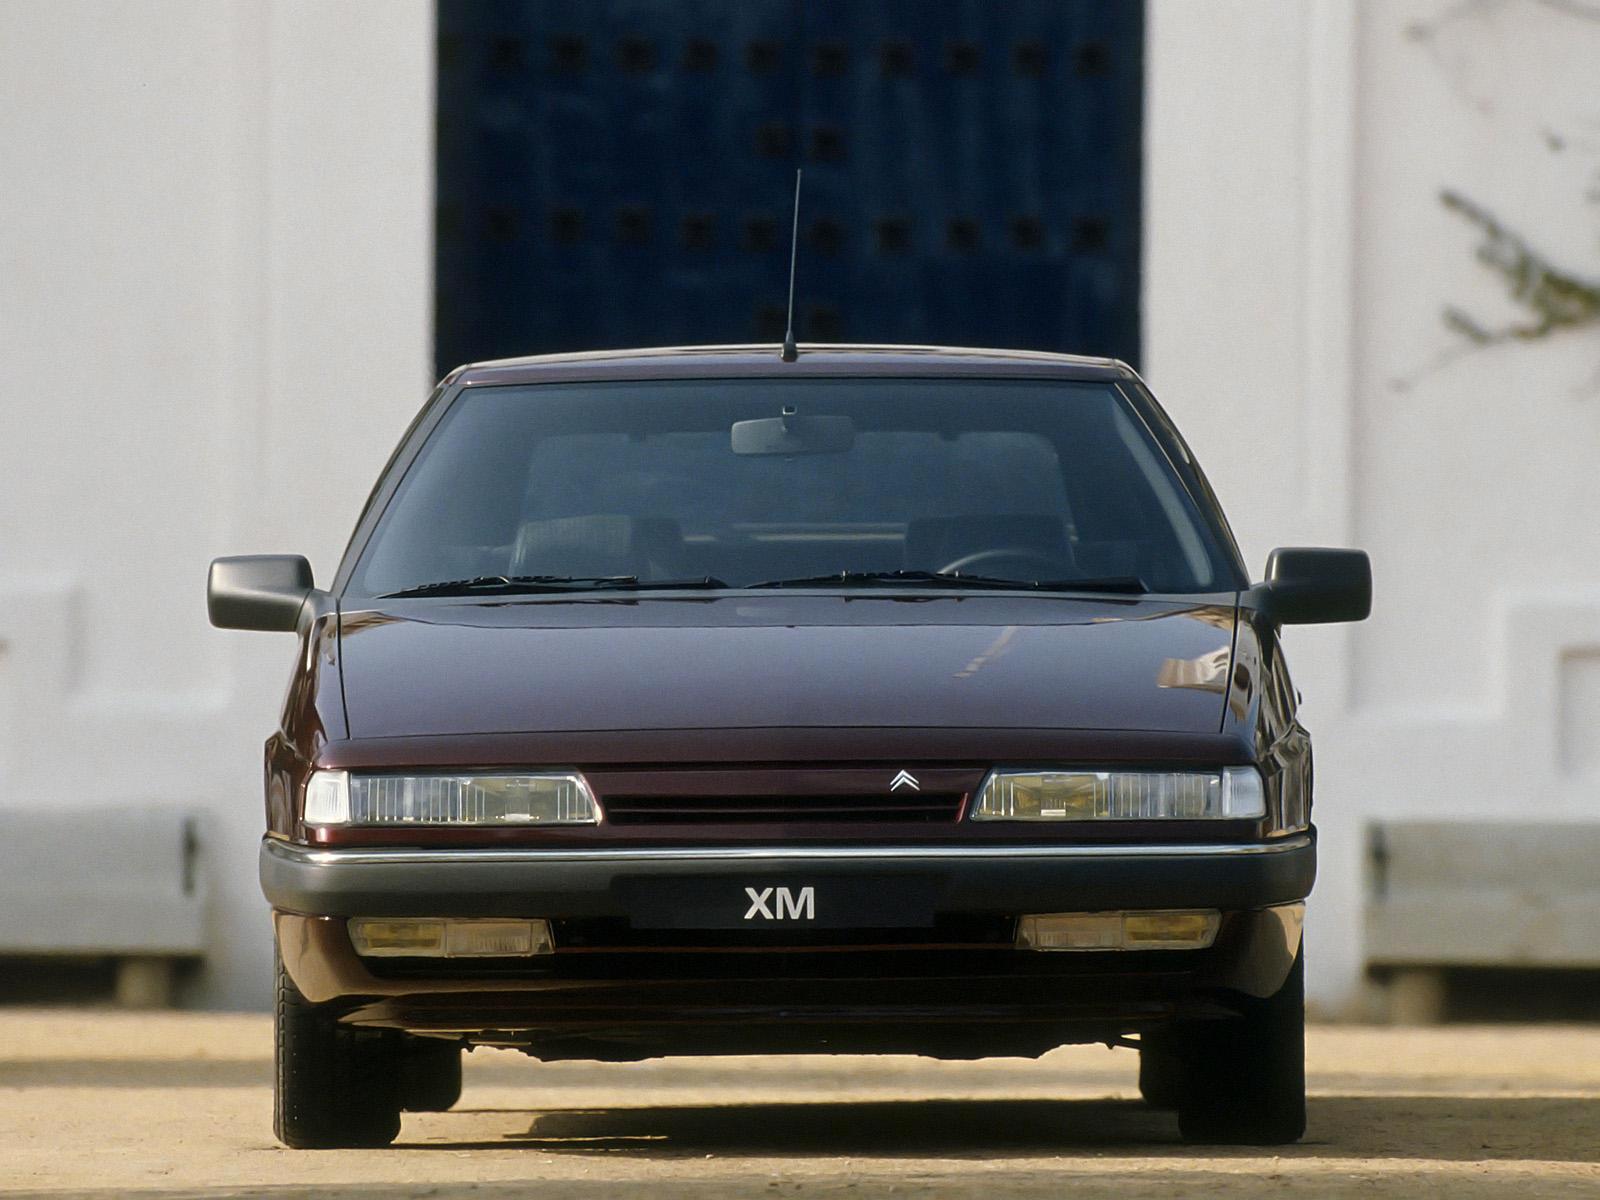 XM 1989 face avant